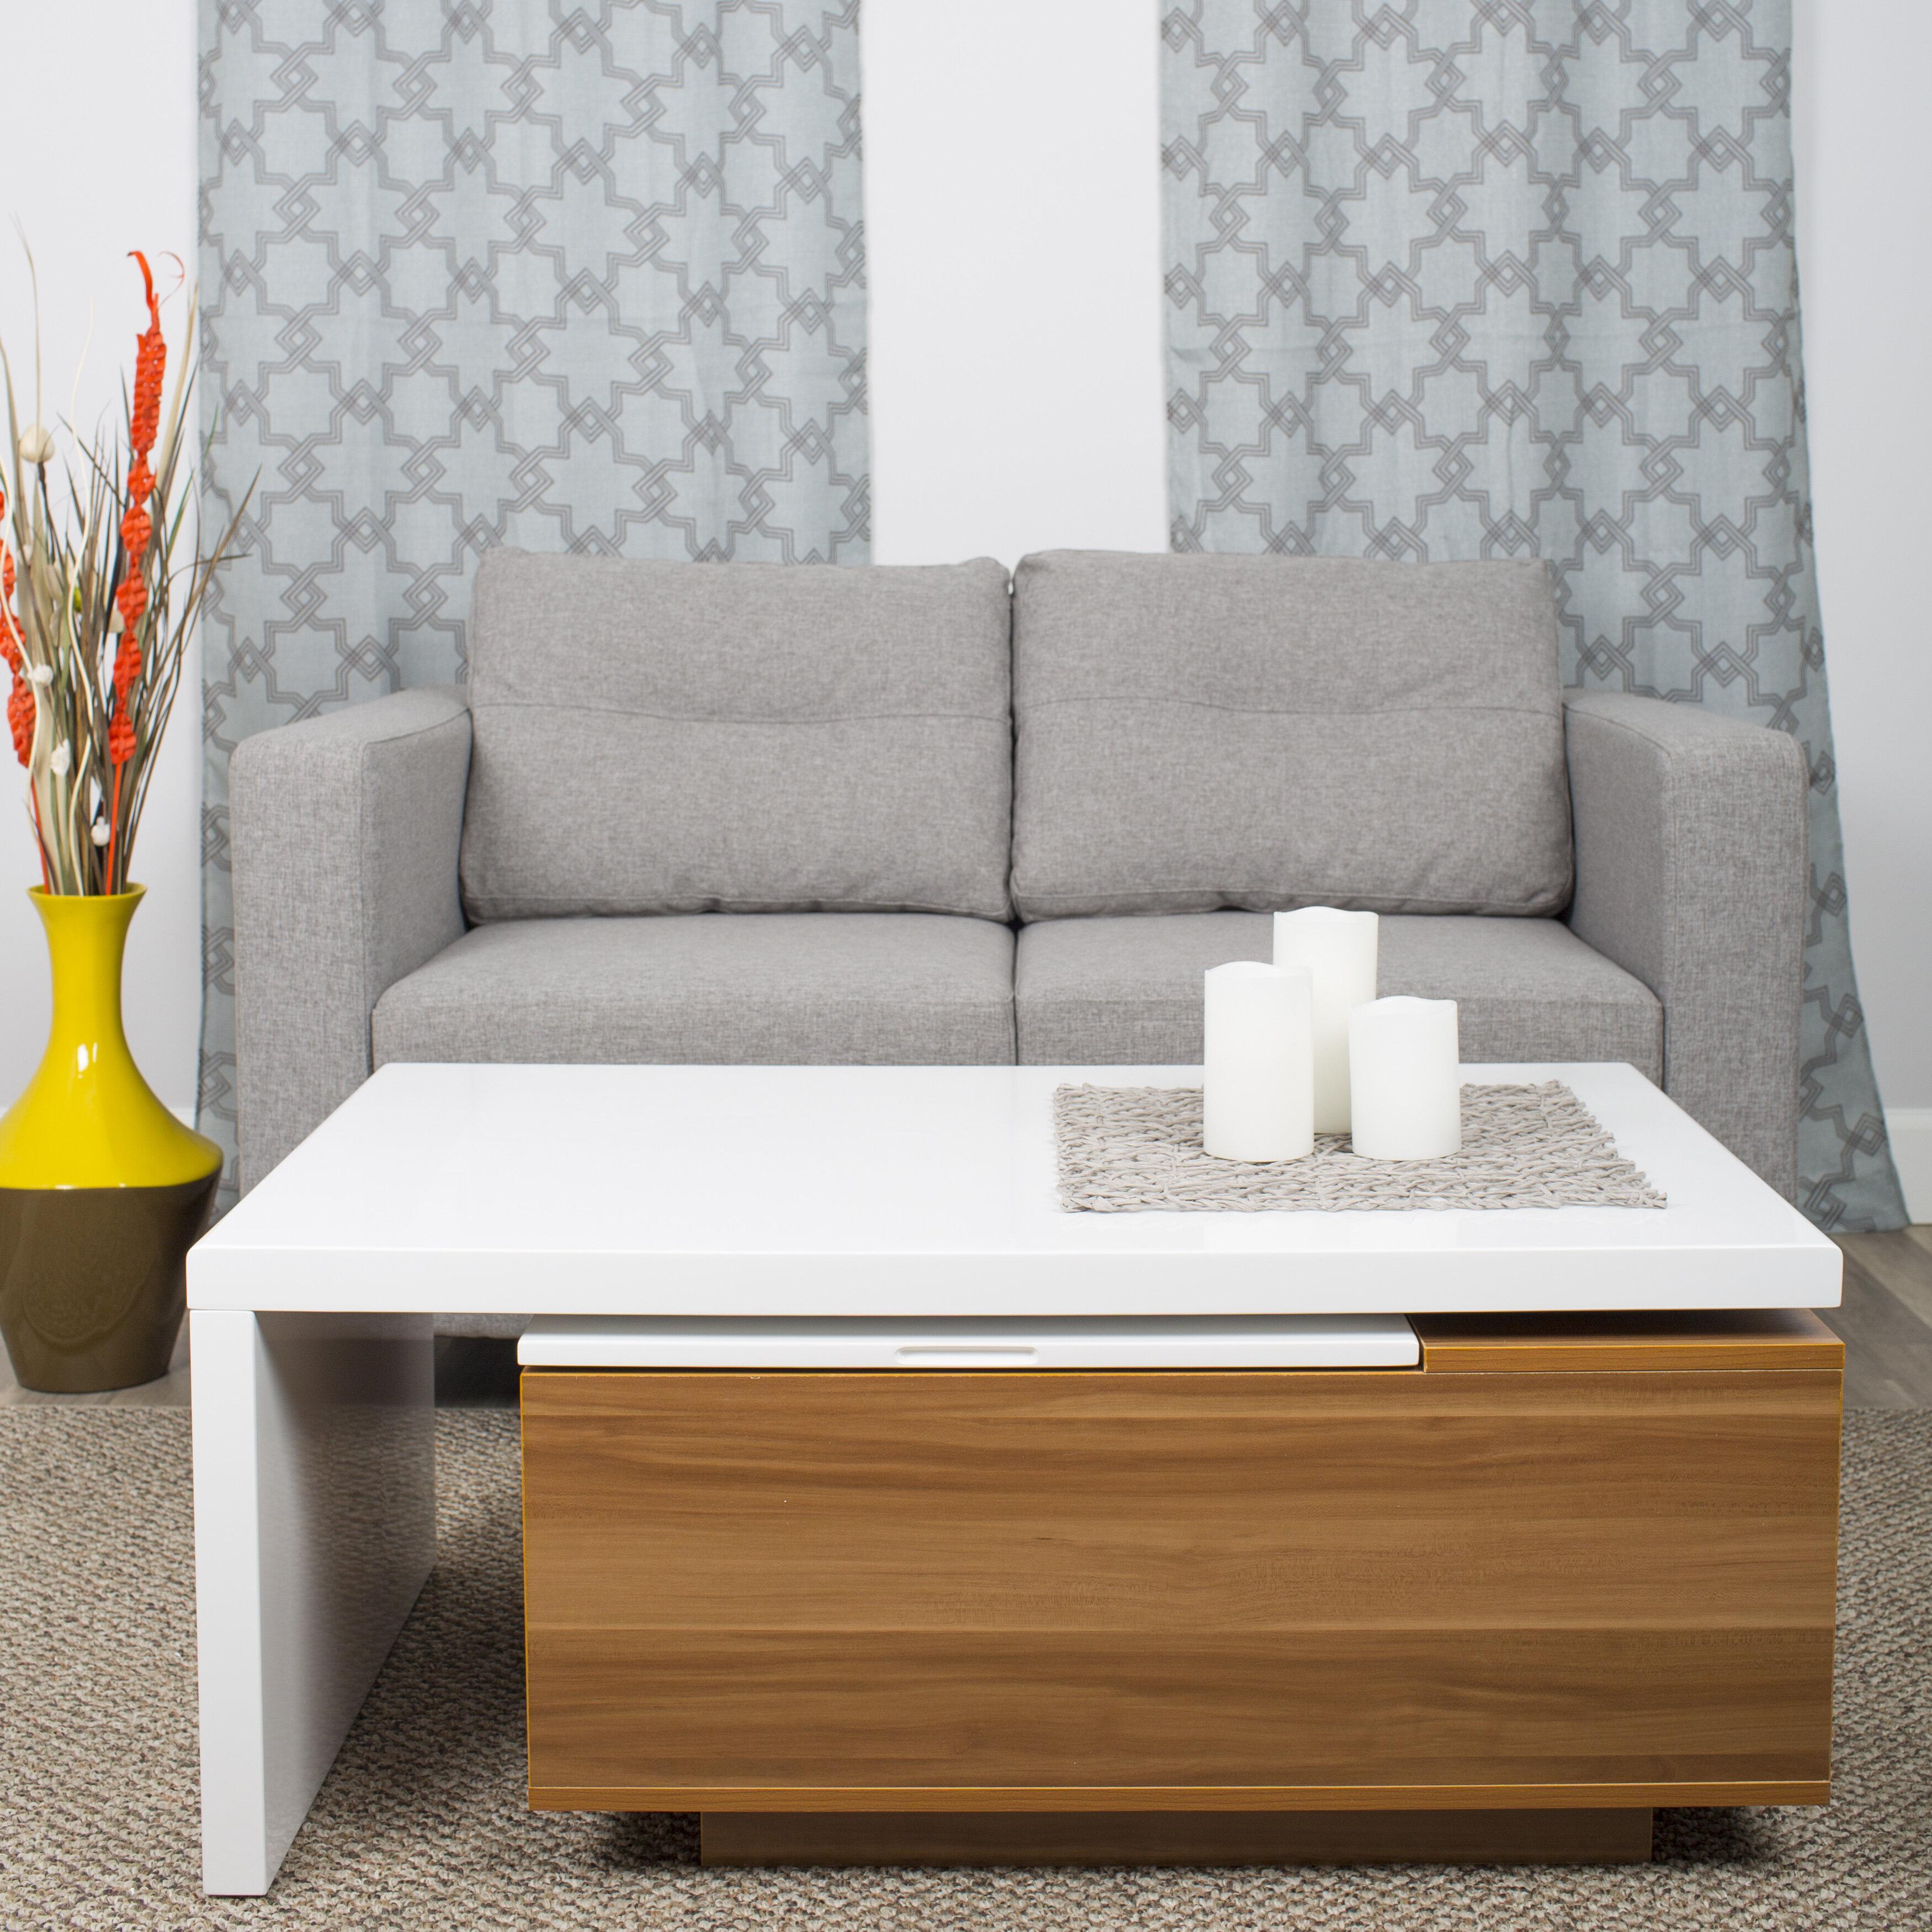 Orren Ellis Alexandira Lift Top Coffee Table With Storage Reviews Wayfair [ 3500 x 3500 Pixel ]